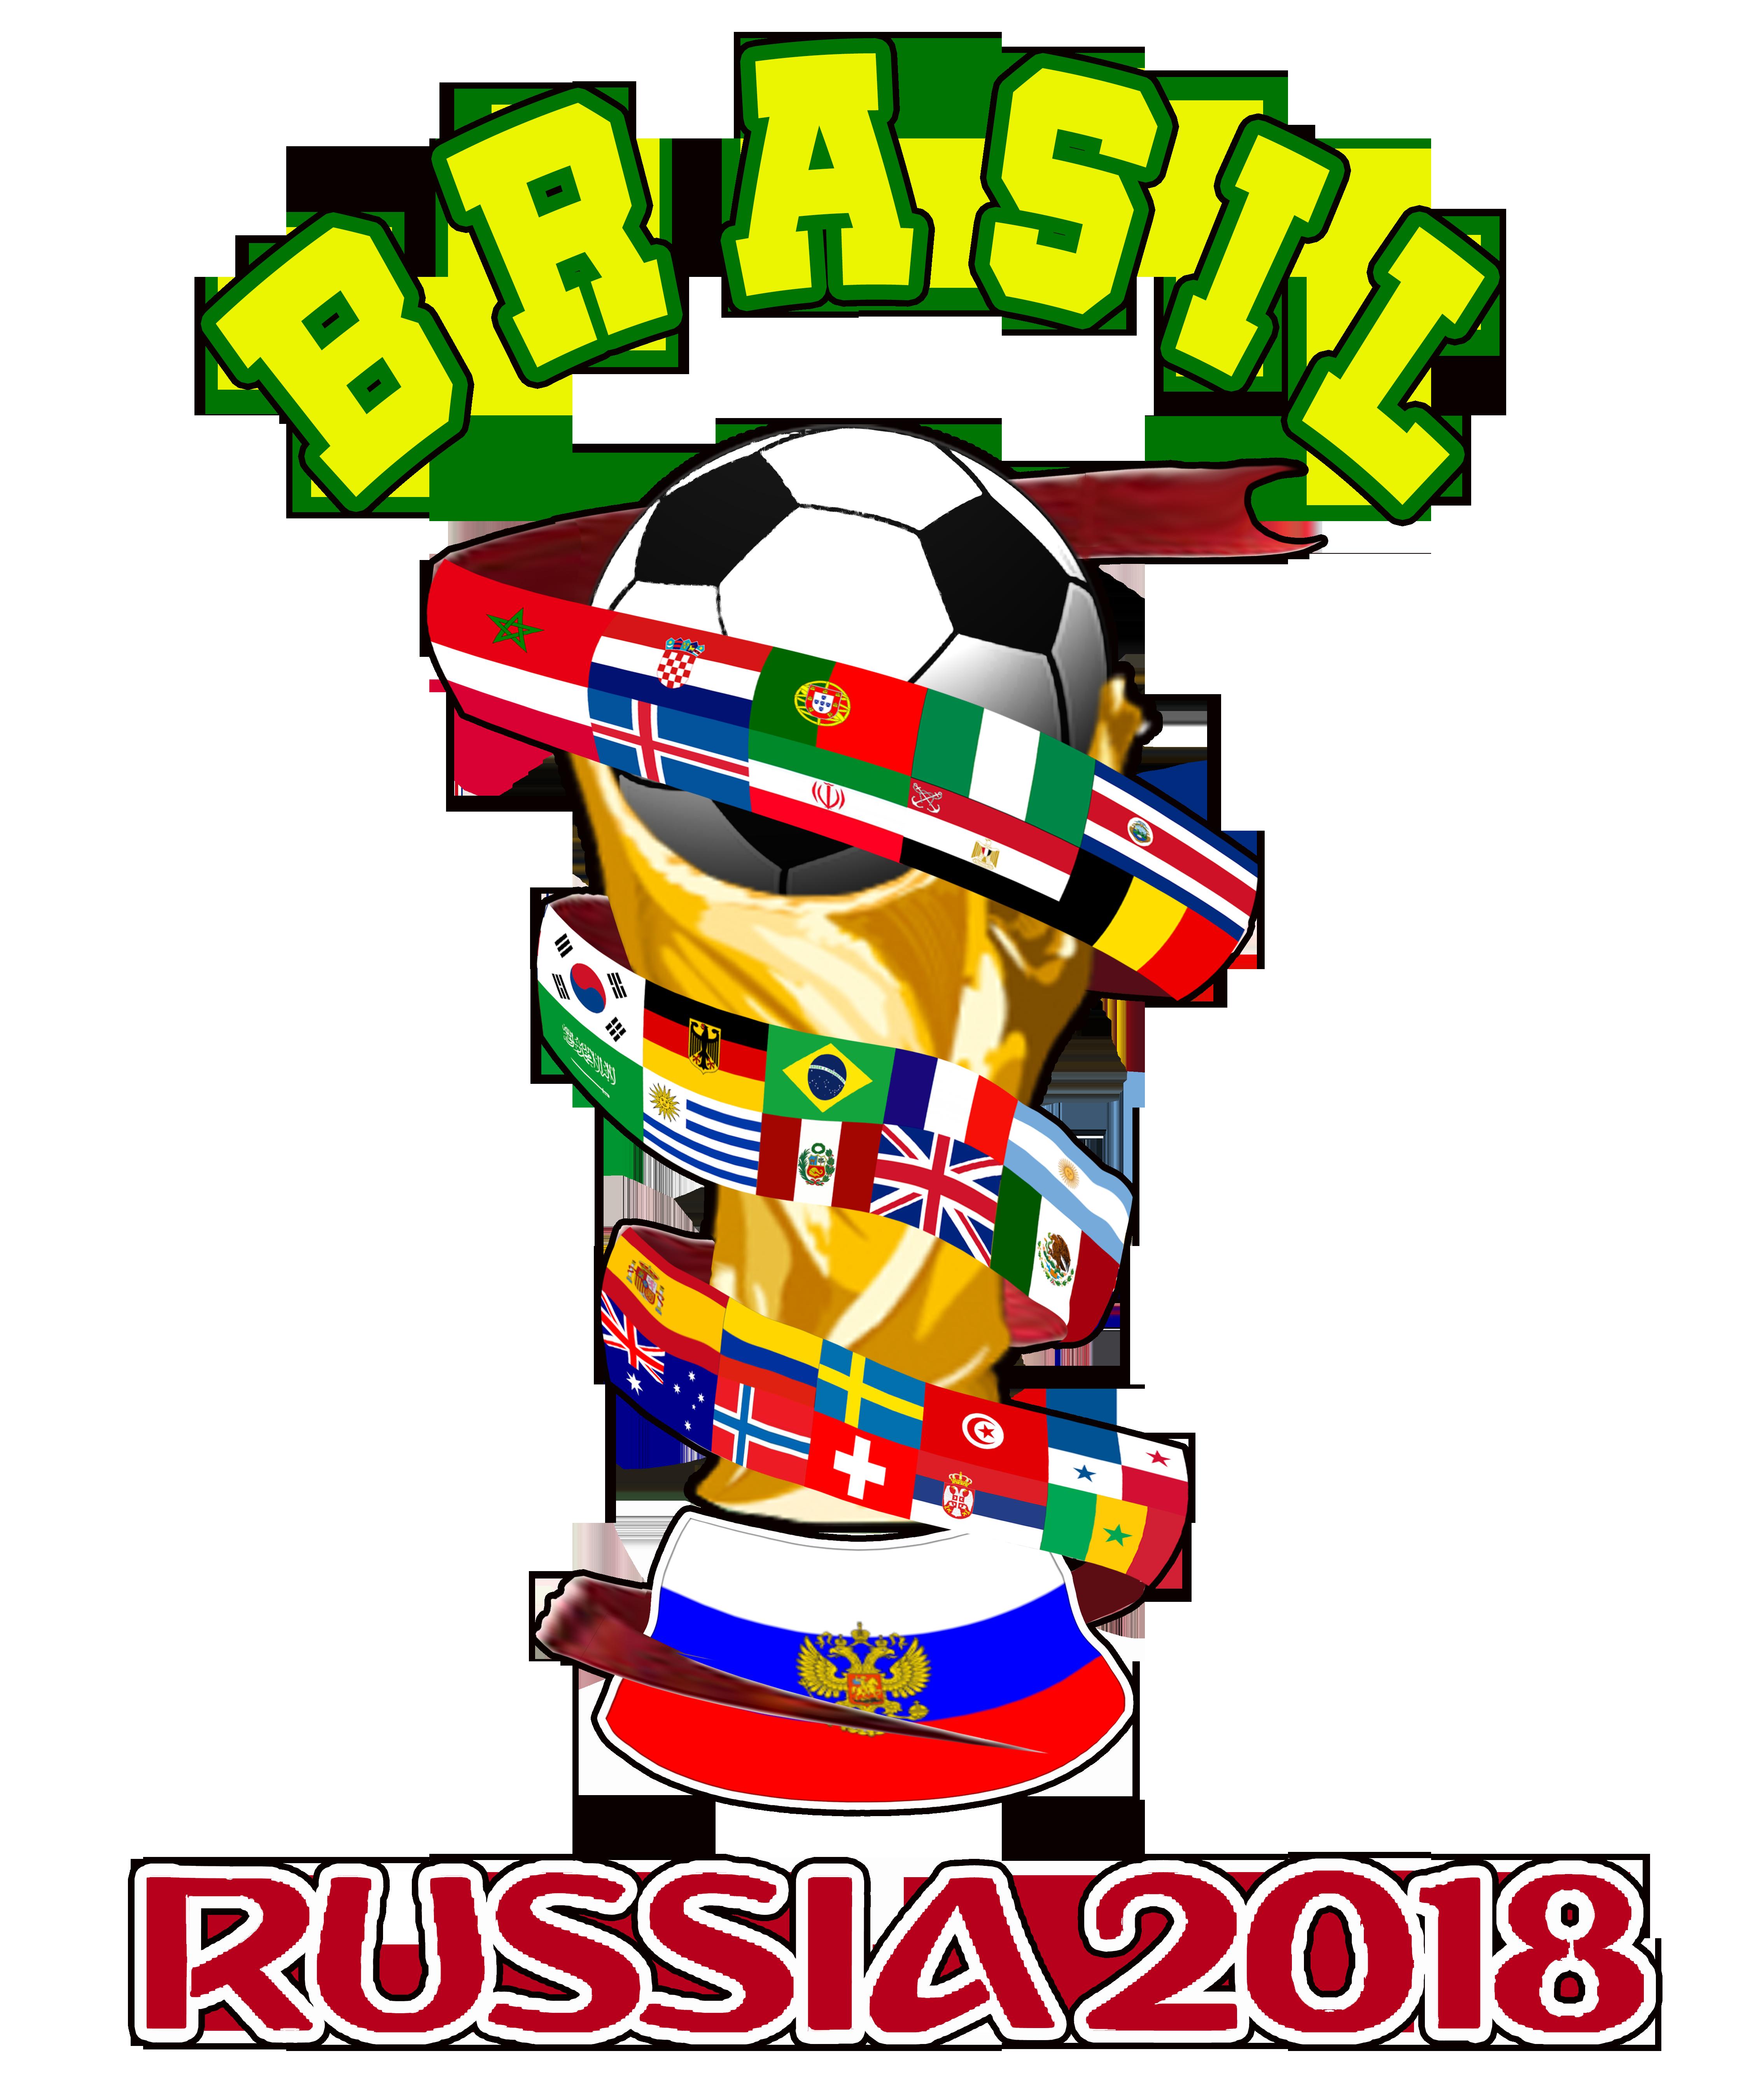 Brasil World Cup Russia 2018 World Cup Russia 2018 World Cup Brazil World Cup